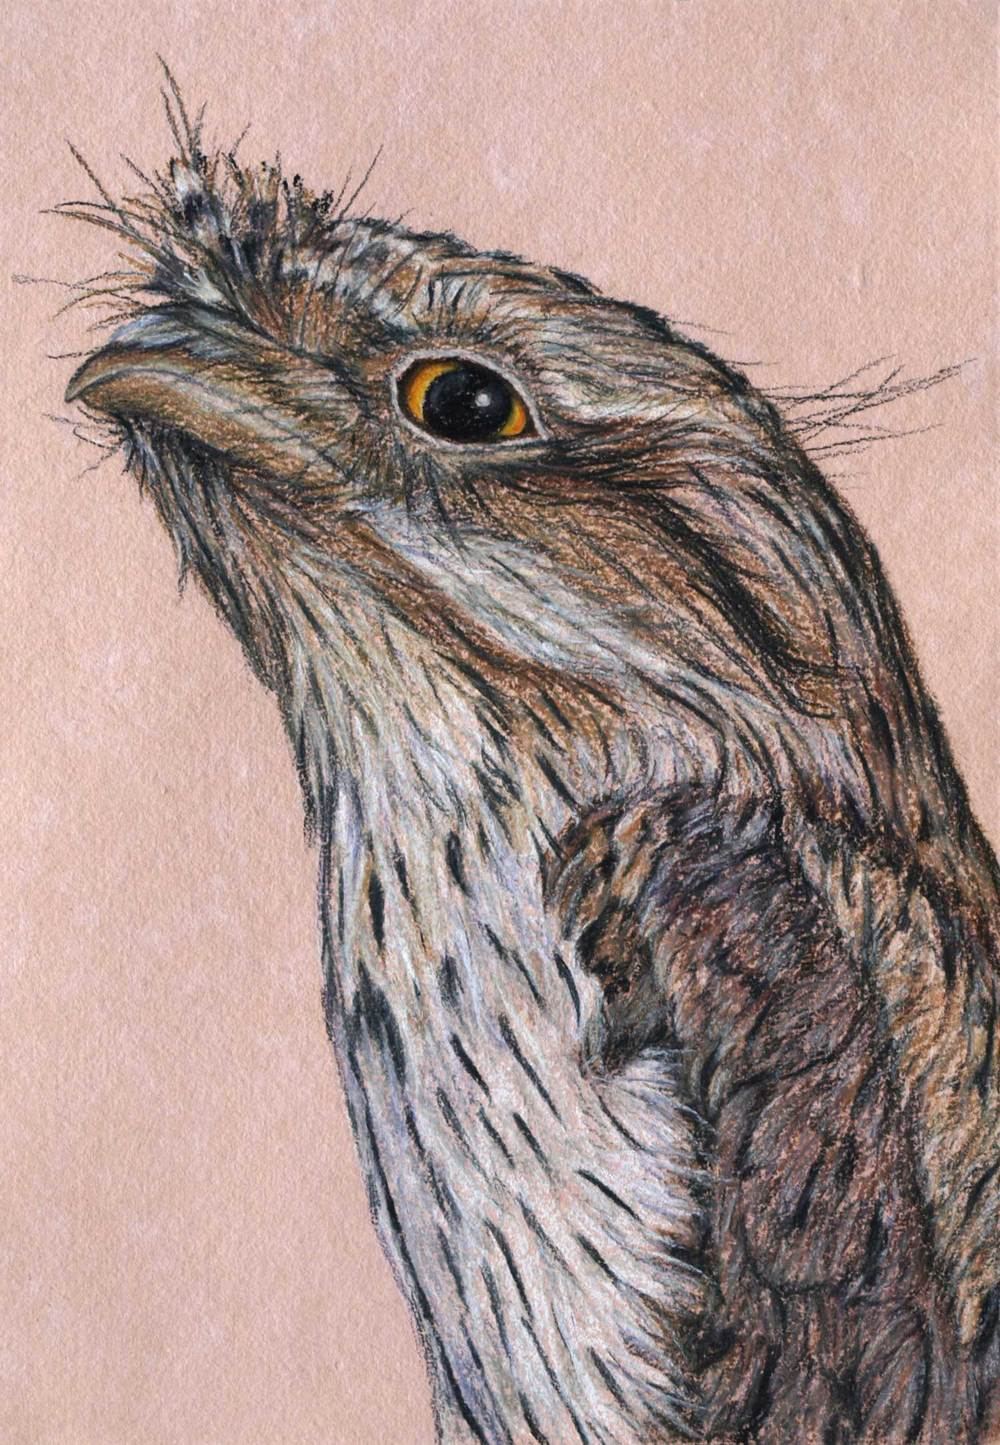 tawny-frogmouth-drawing-rachel-newling.jpg